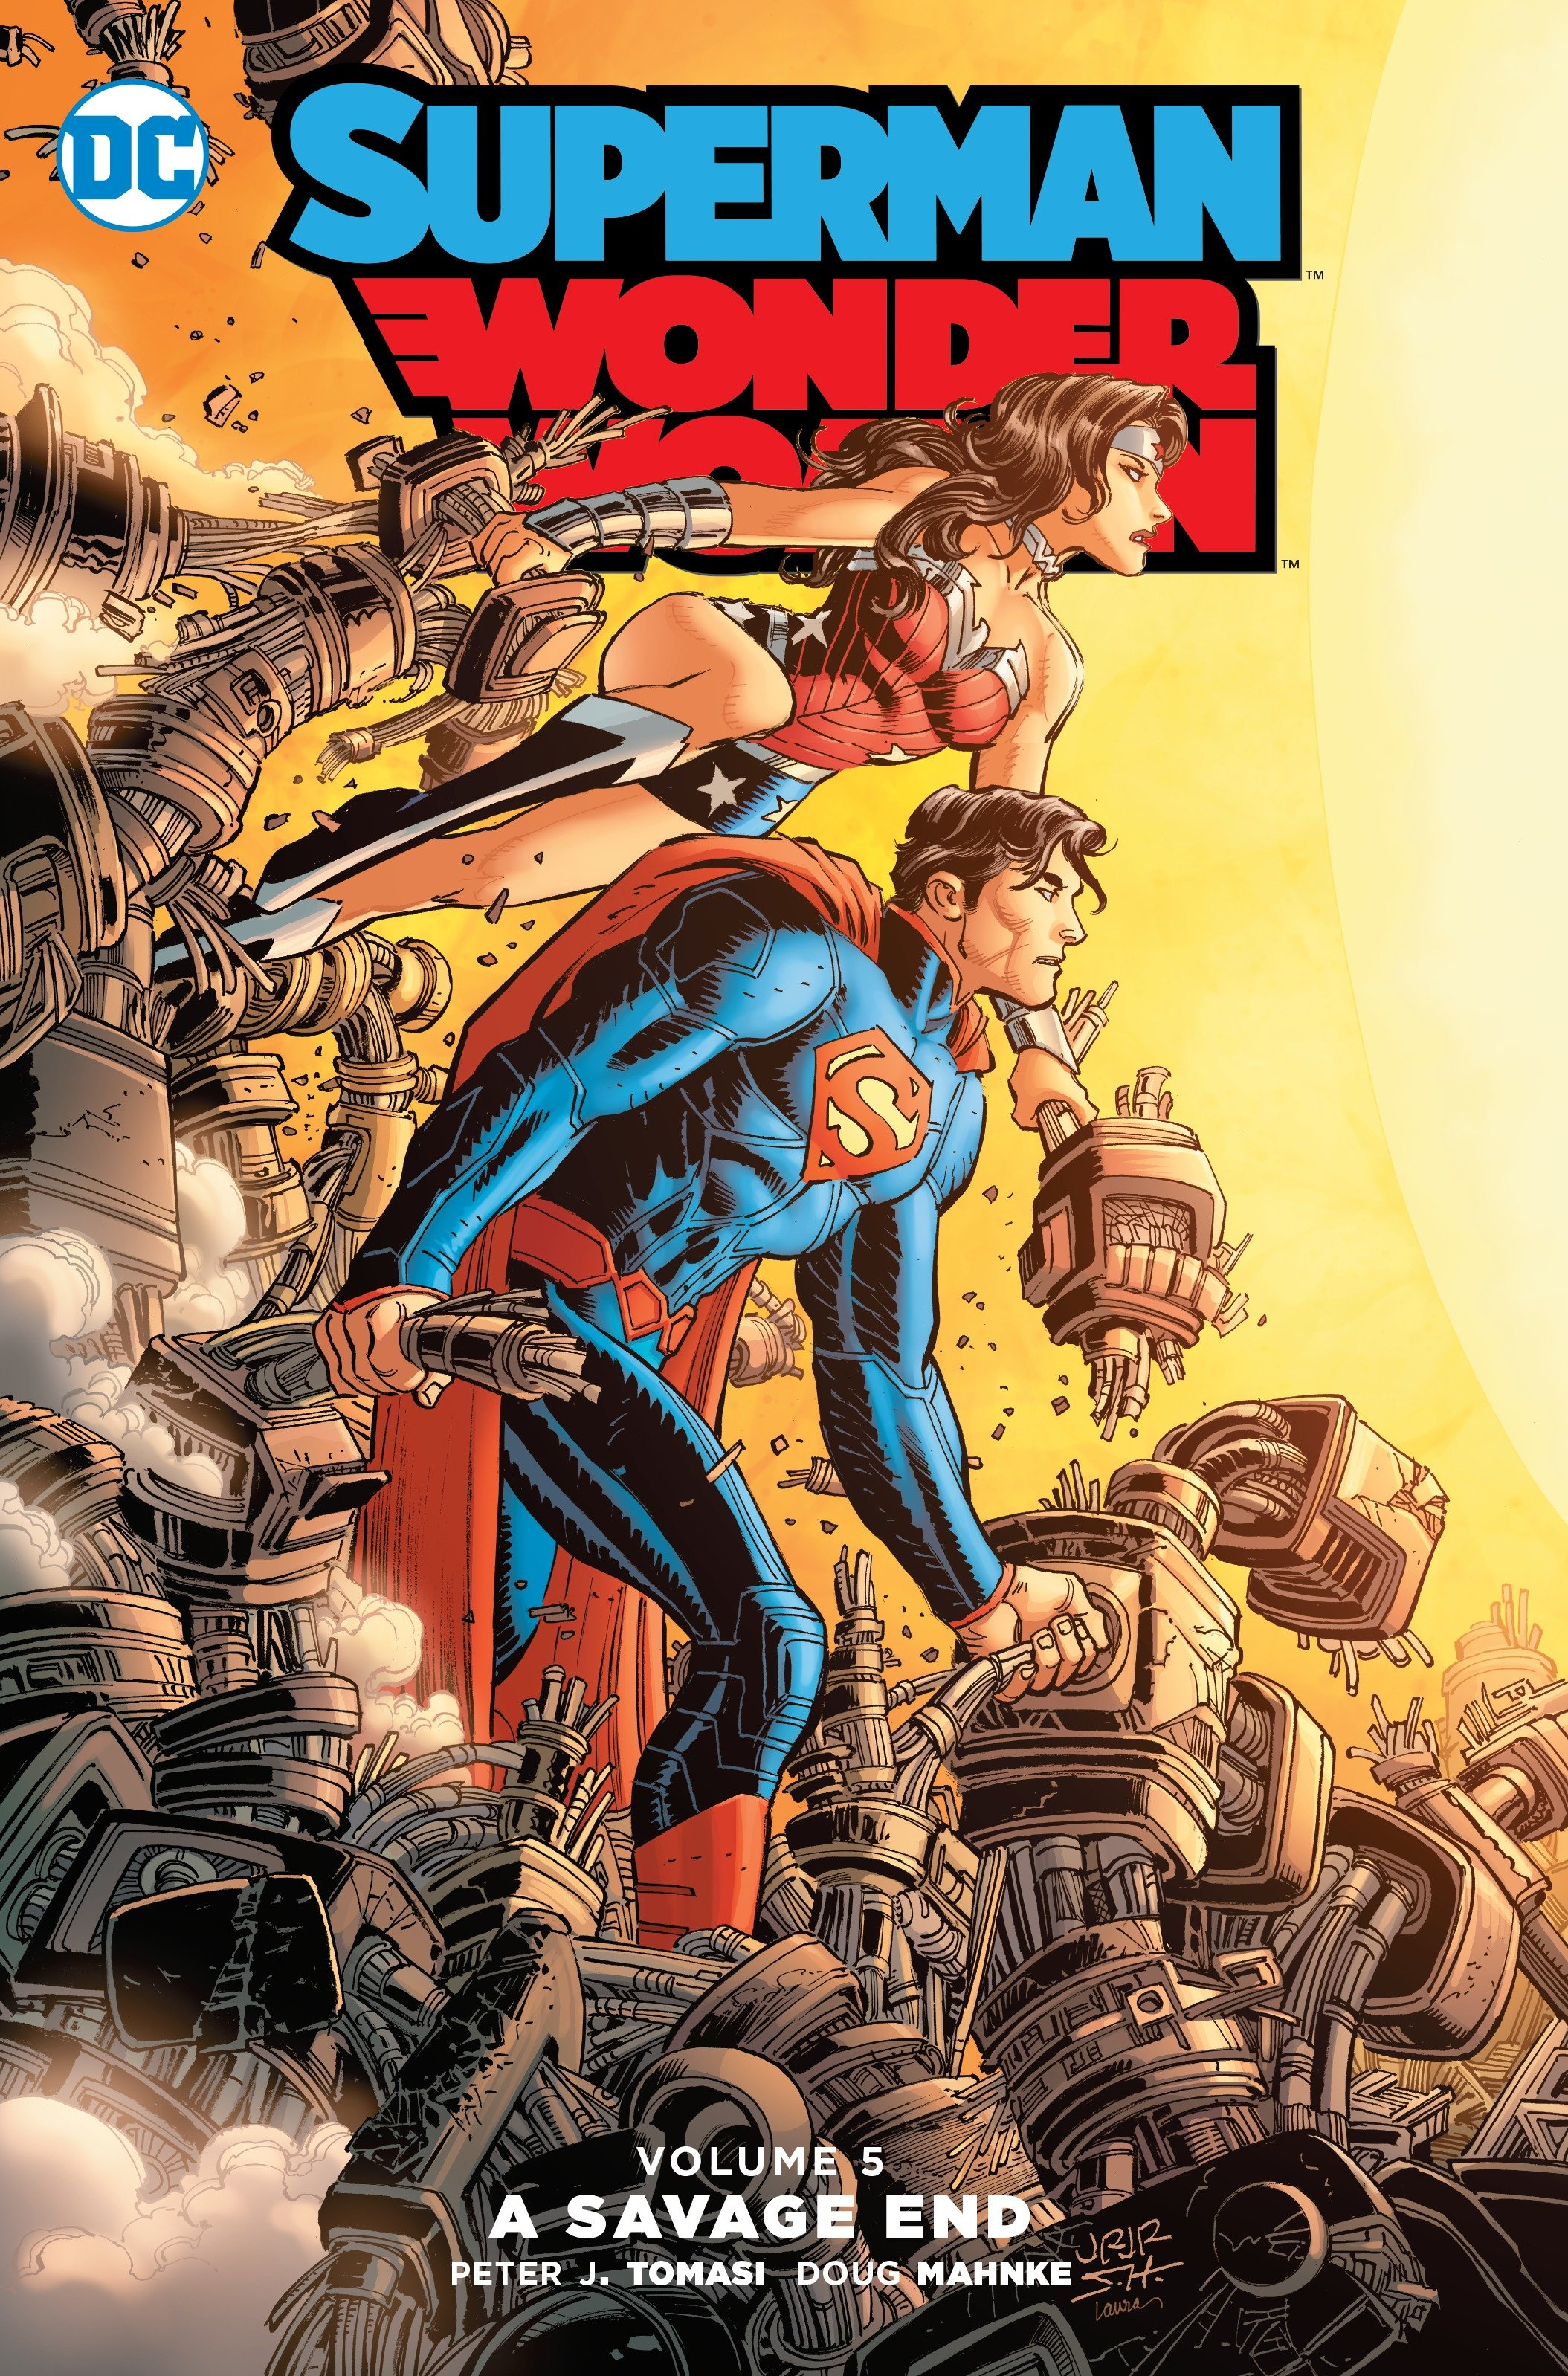 Supermanwonder Woman Vol 5 A Savage End - Walmartcom-5264